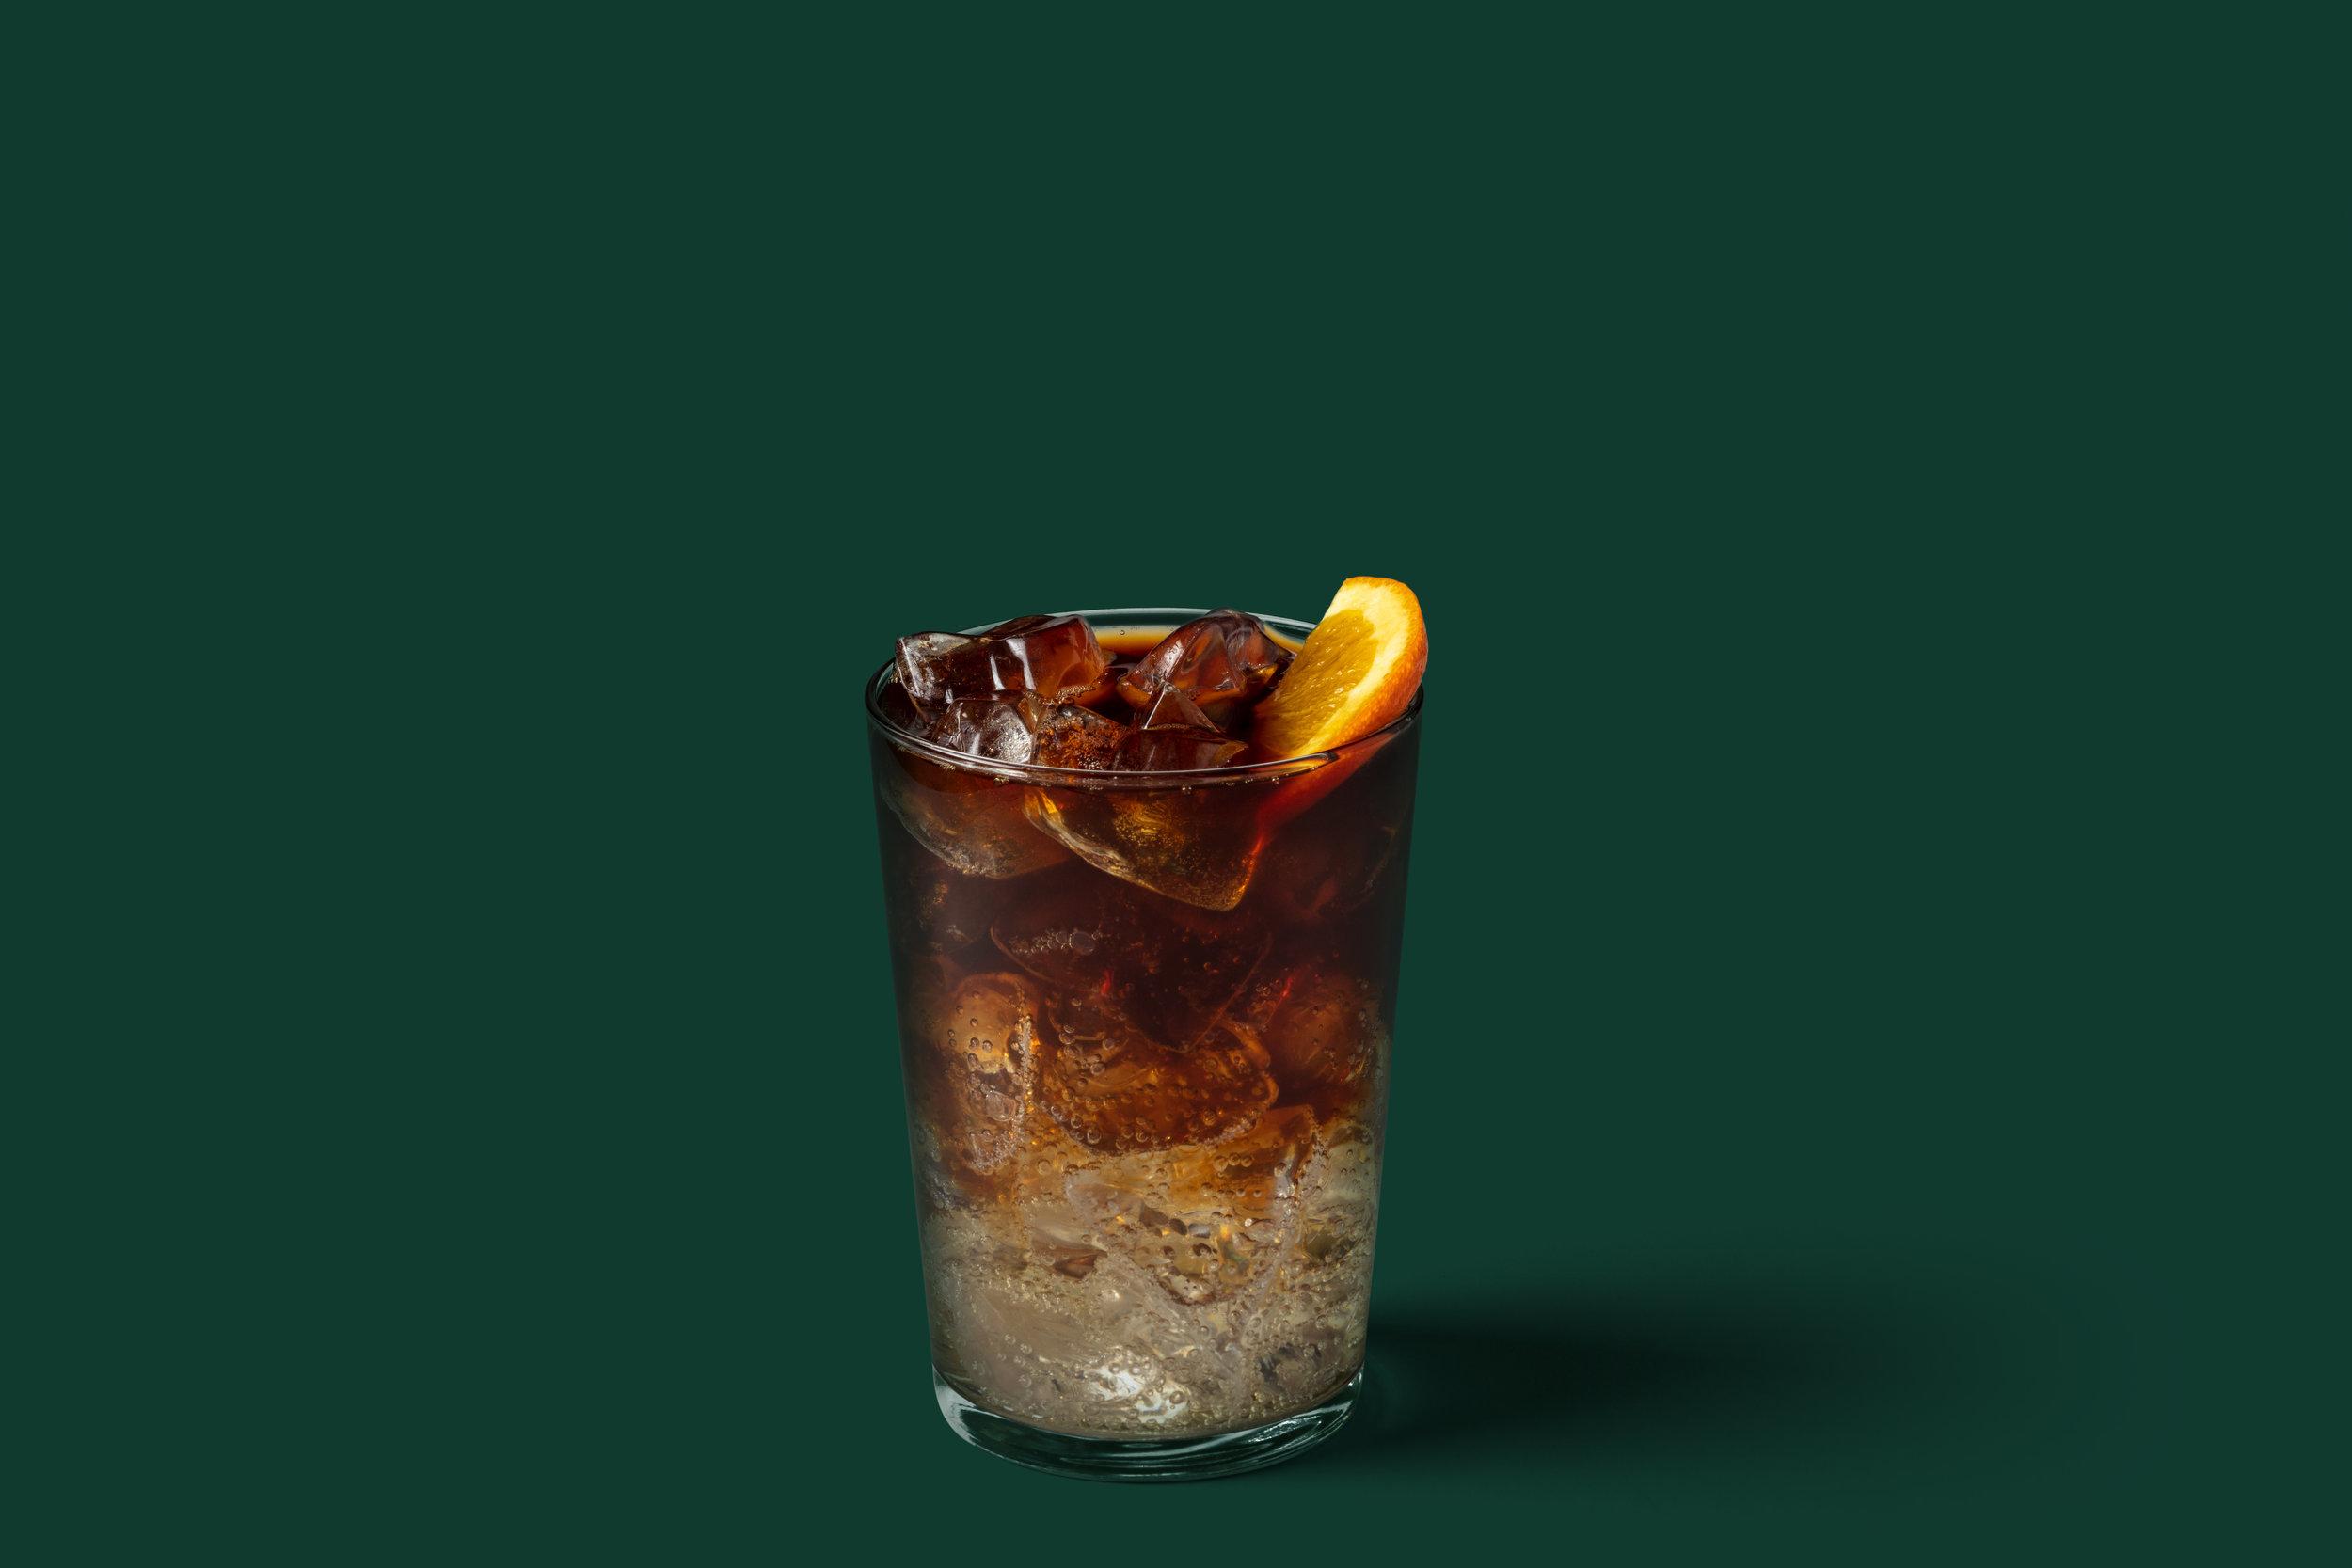 COLD BREW WITH GINGER ALE TONIC - Τέλεια ισορροπία καφέ και τόνικ: Η ελαφρώς γλυκιά και εκλεπτυσμένη γεύση του Cold Brew, σε συνδυασμό με το τόνικ τζίντζερ, προσφέρει μια ελαφρώς πικάντικη ανατρεπτική νότα χωρίς να υπερκαλύπτει την γεύση του καφέ. Σερβίρεται με πάγο και με μια φρέσκια φέτα πορτοκαλιού για μια ολοκληρωμένη εμπειρία αρωμάτων και γεύσεων. Ιδανικό για στιγμές δροσιάς και αναζωογόνησης τις πιο ζεστές ημέρες του καλοκαιριού.